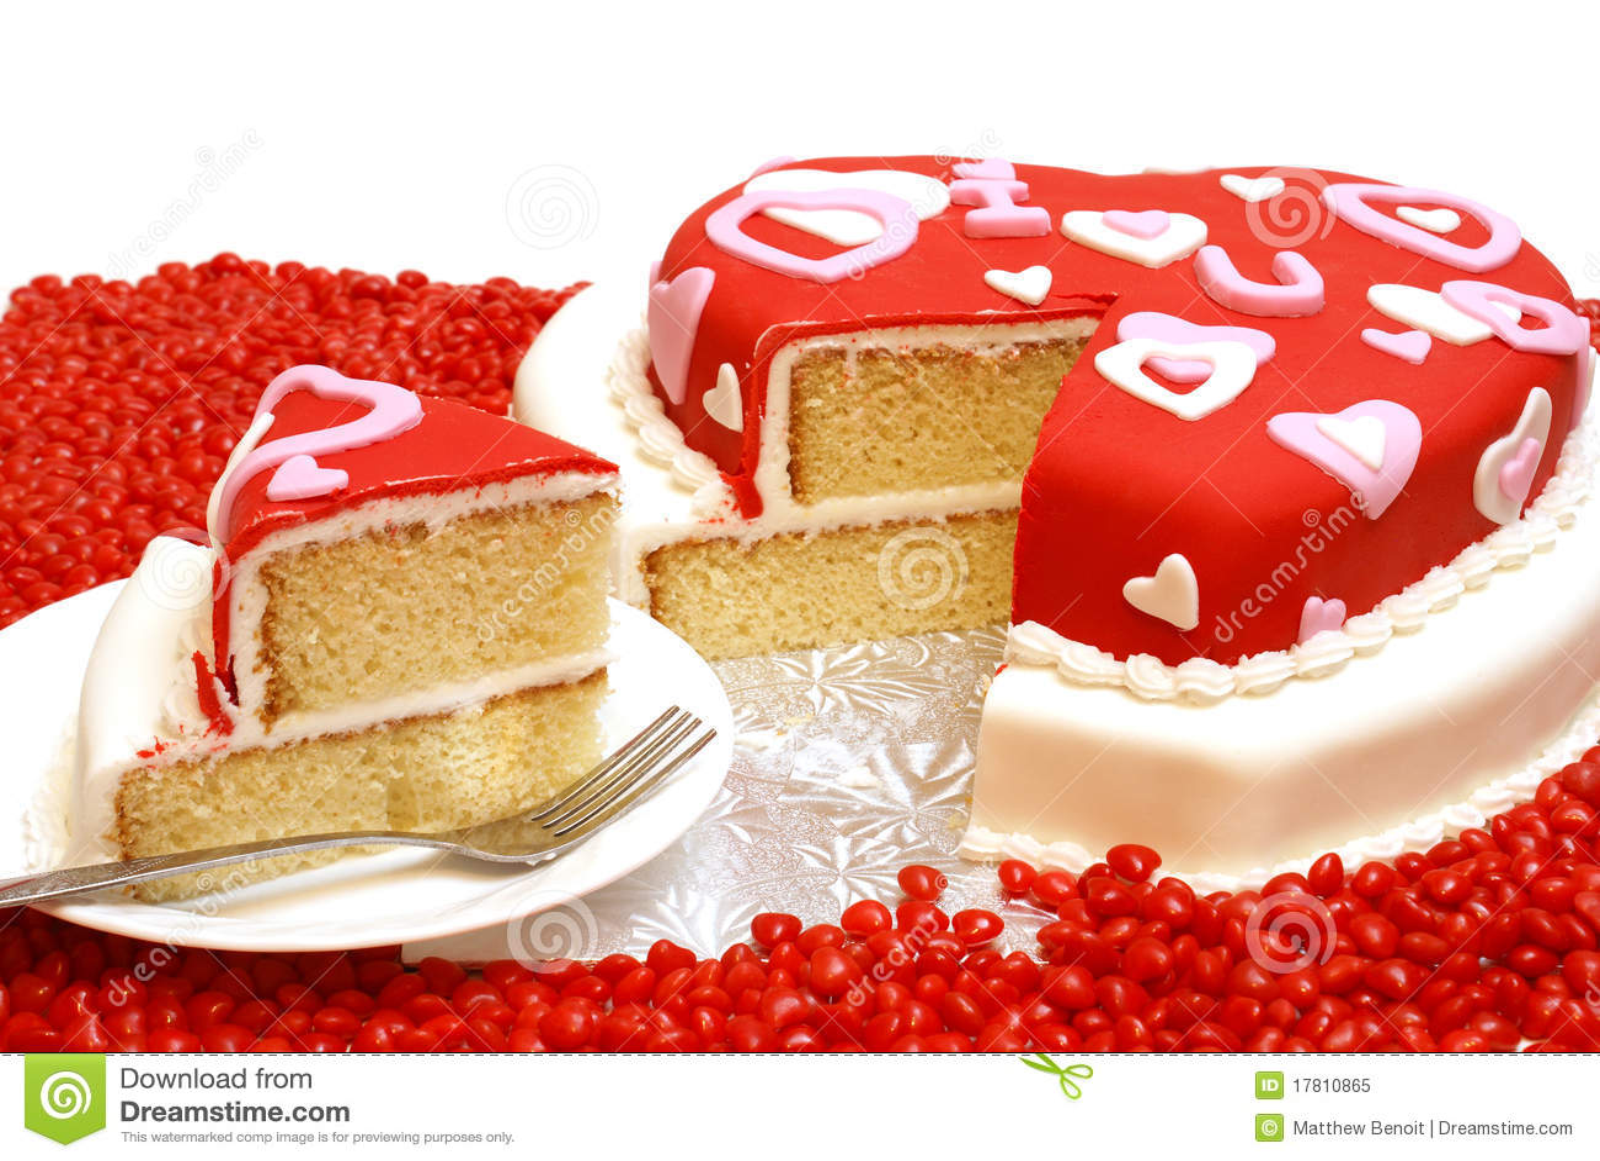 Torta A Forma Di Cuore Immagine Stock Immagine Di Casalingo 17810865